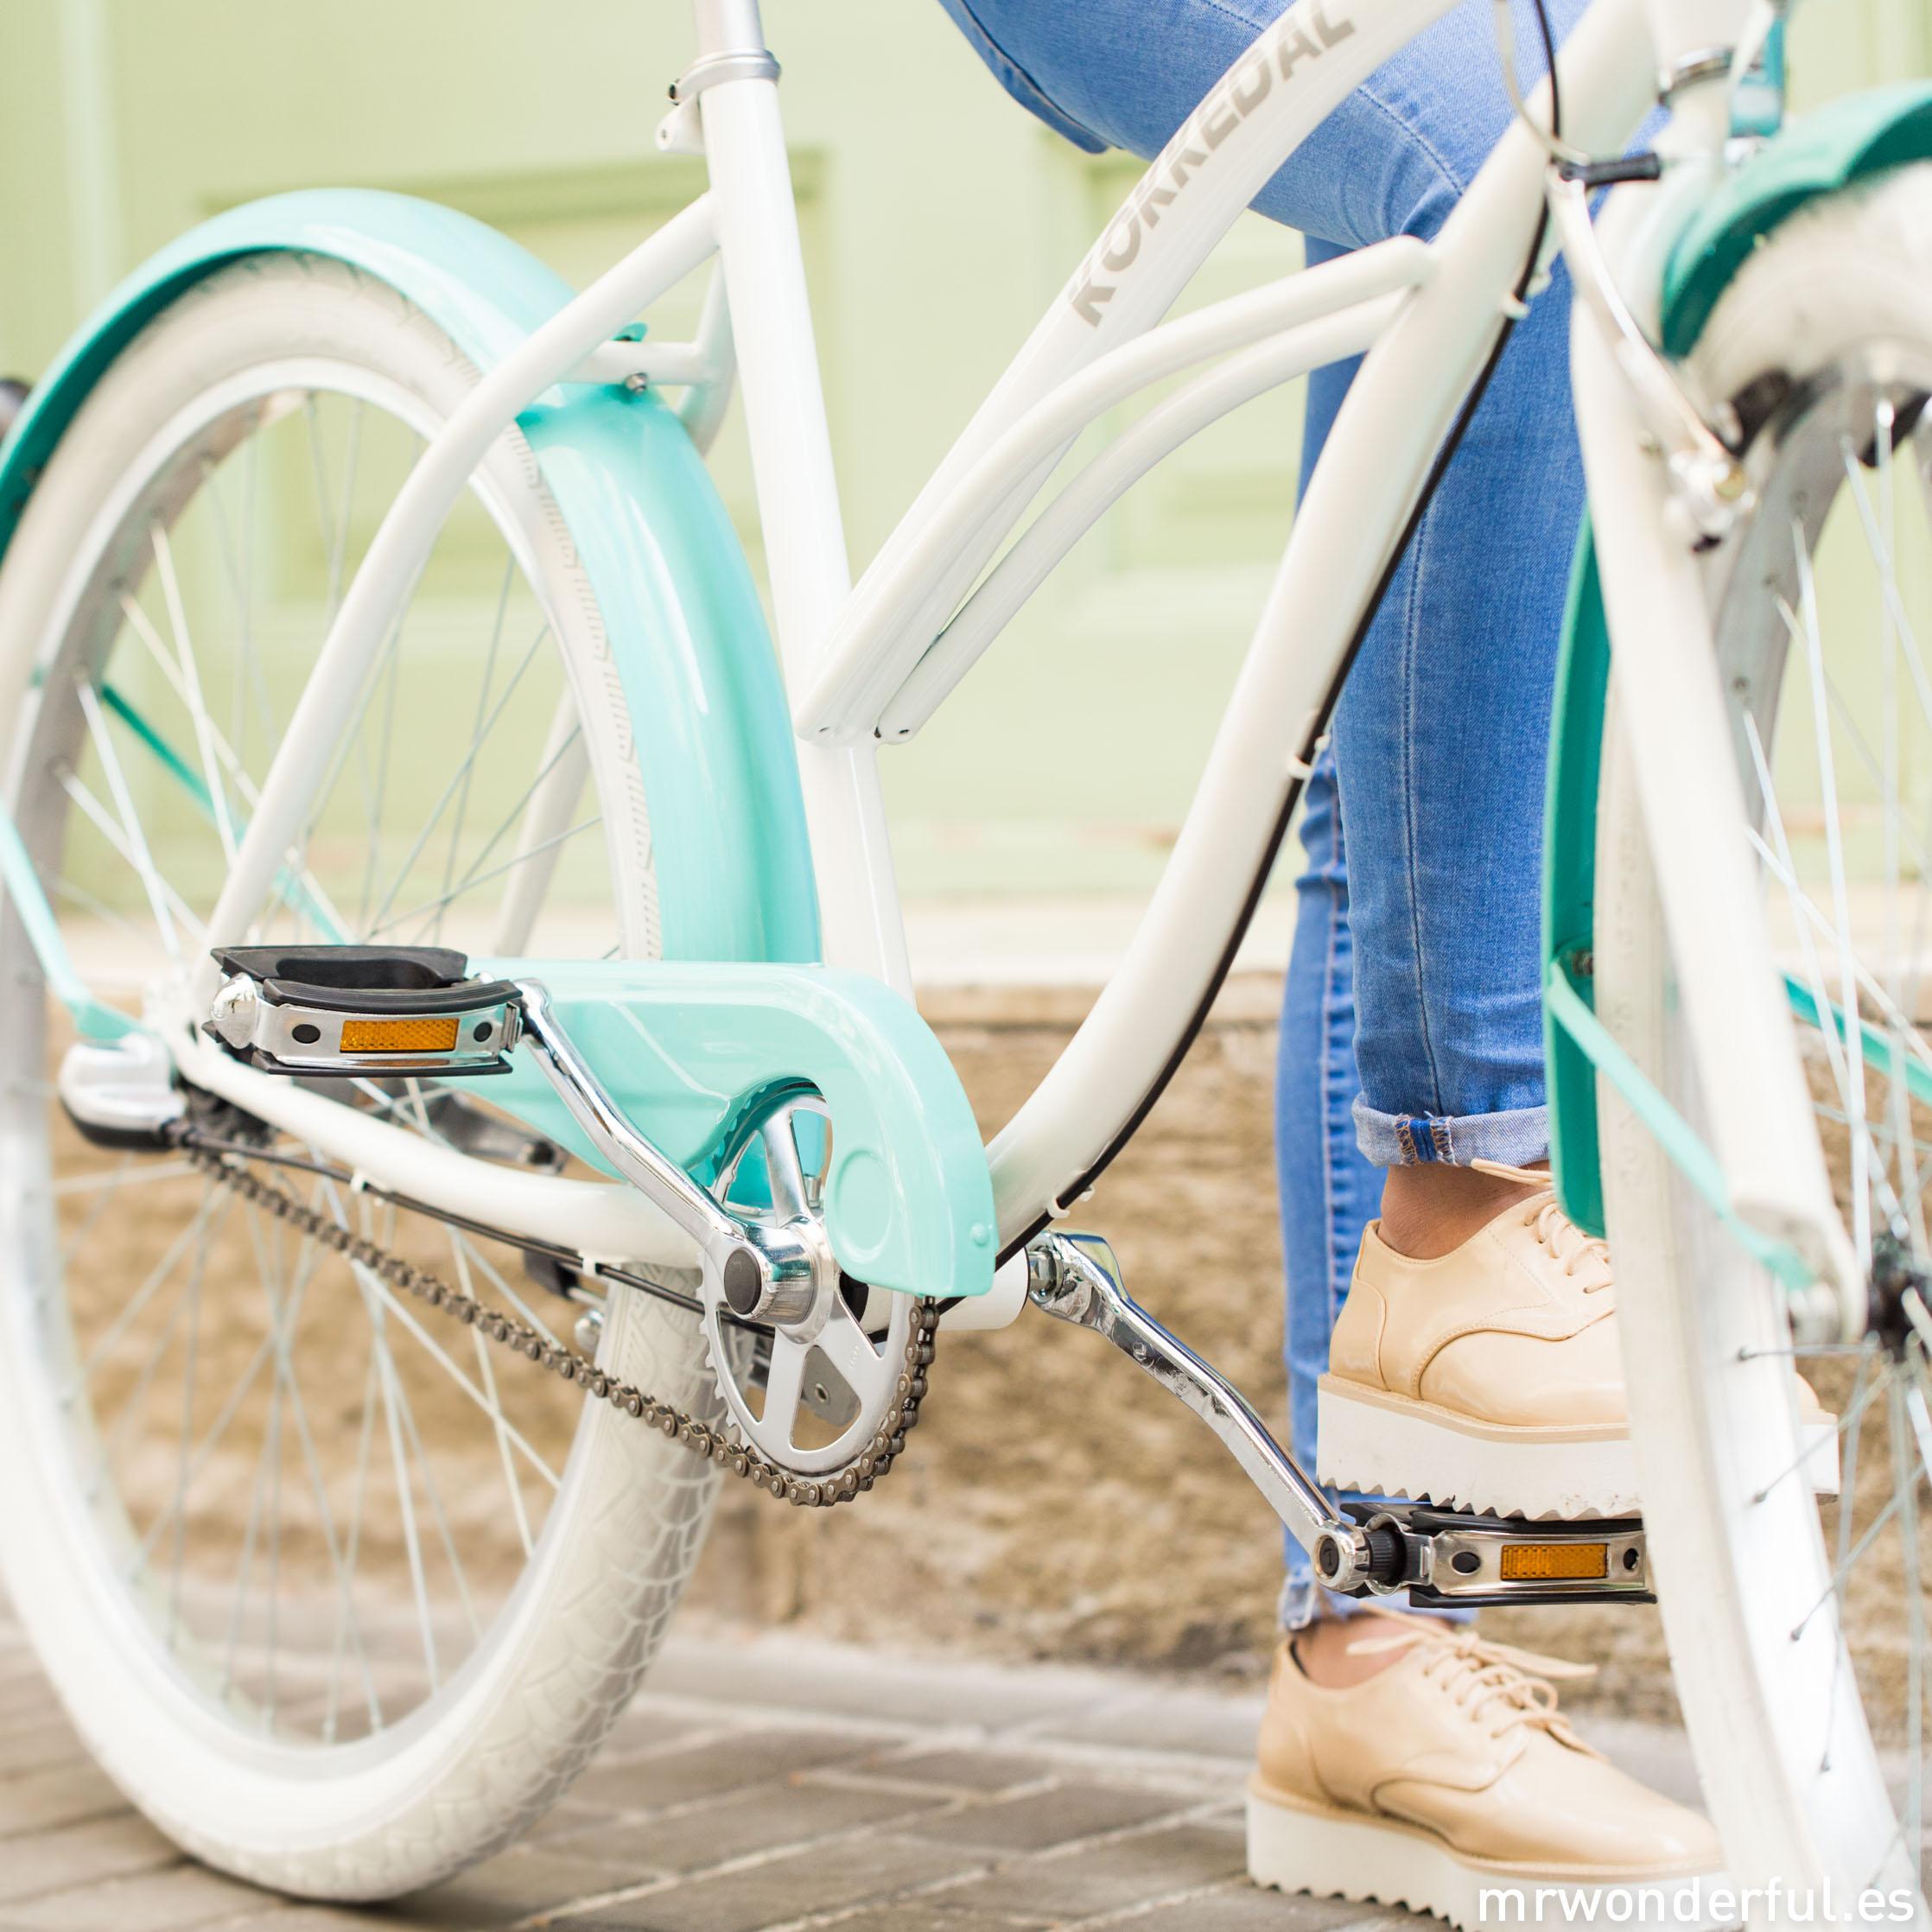 mrwonderful_concurso-bicicleta-29-Editar